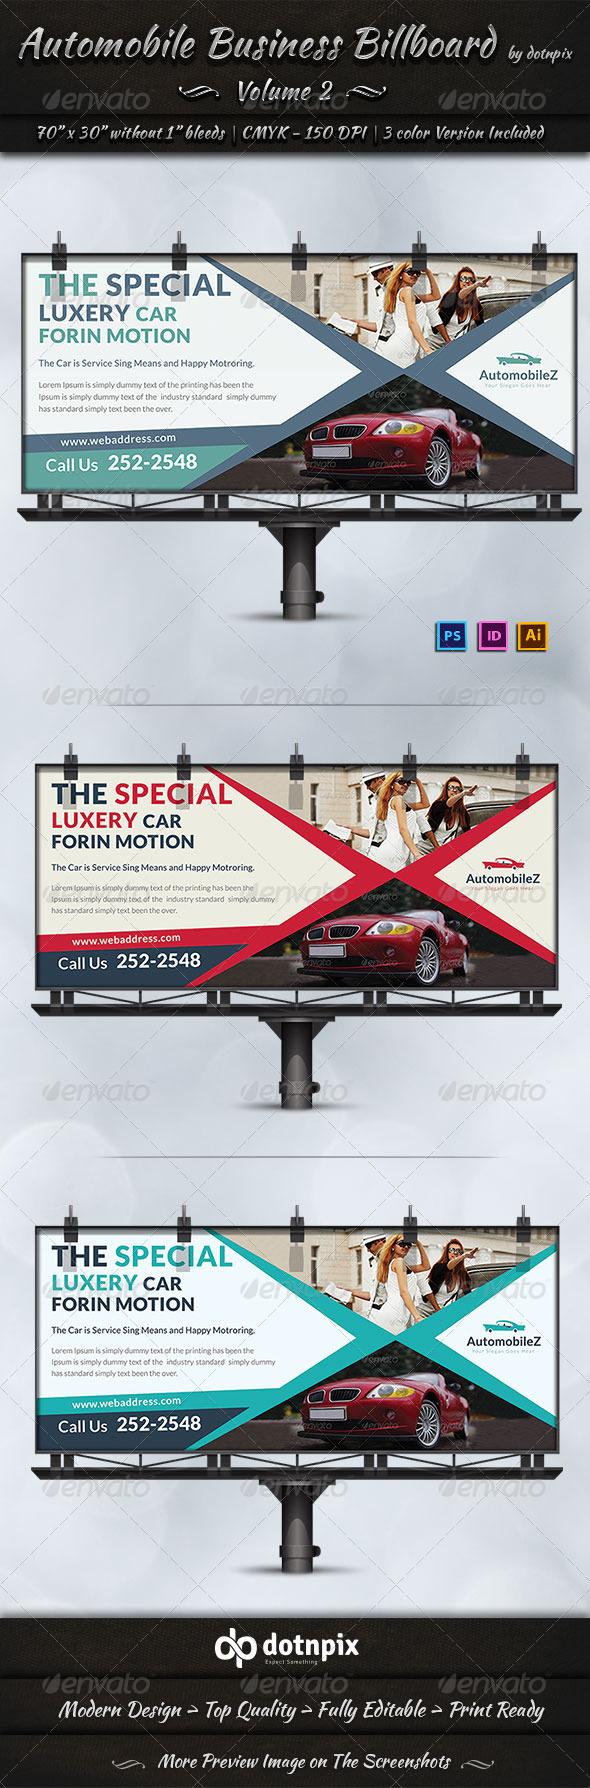 GraphicRiver Automobile Business Billboard Volume 2 6984885